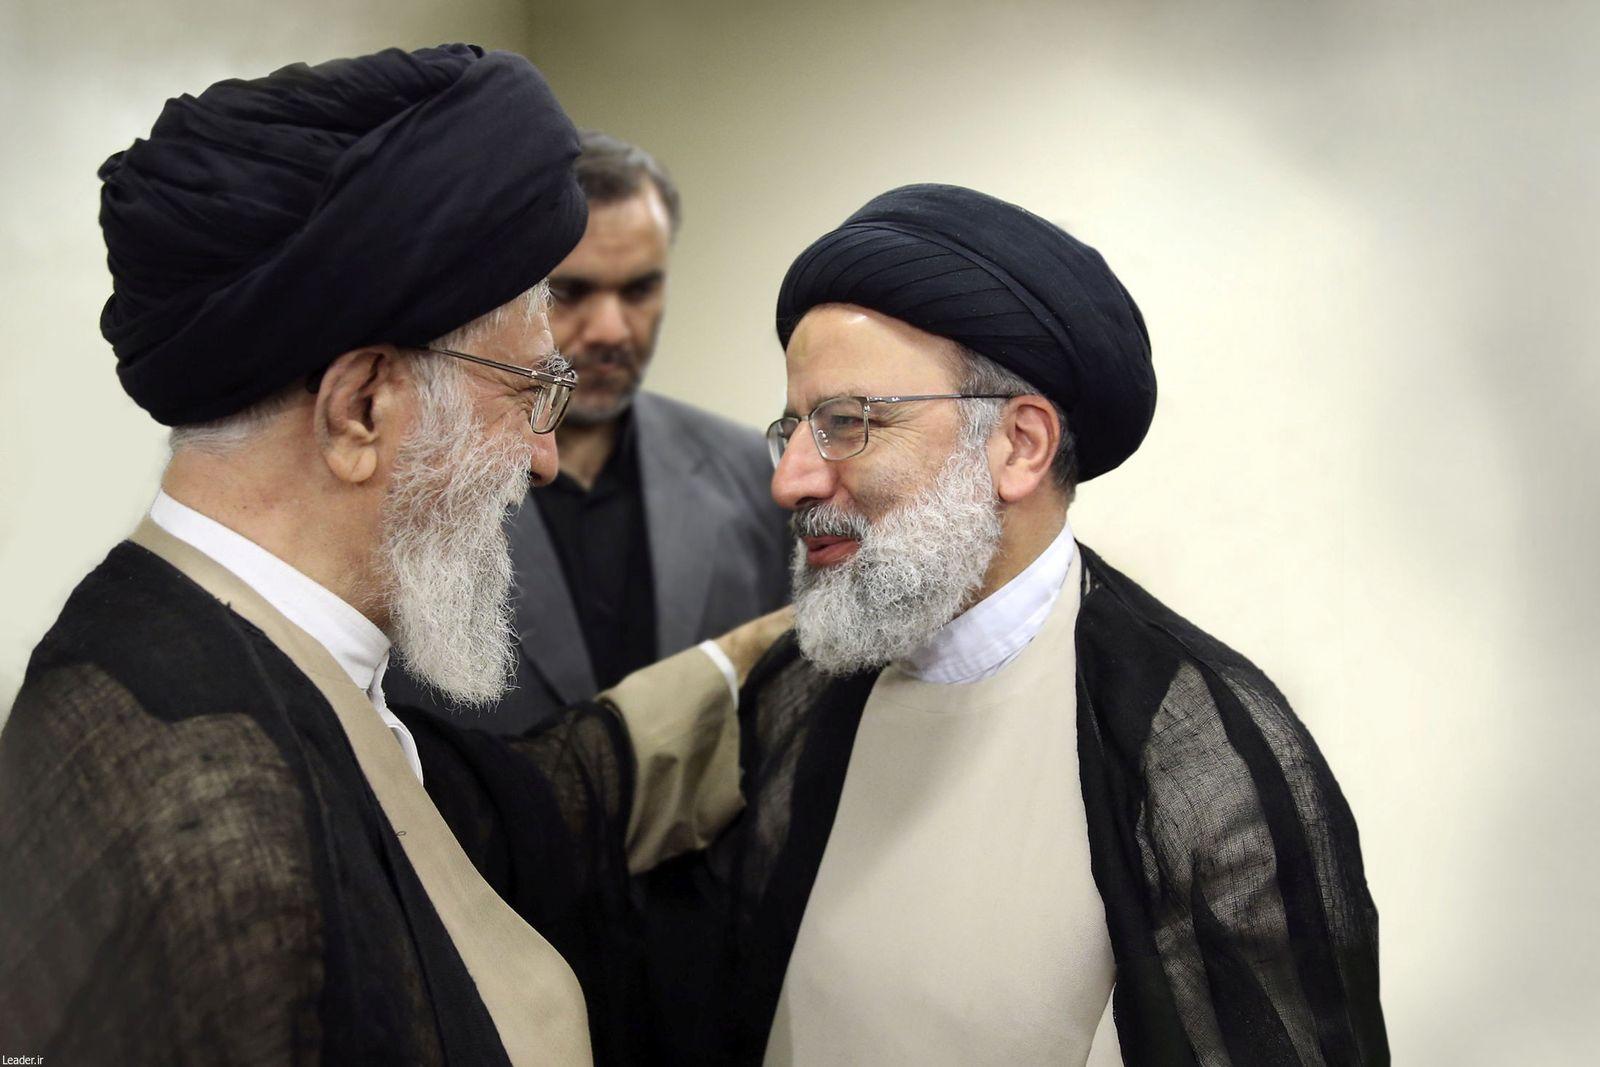 Ali Khamenei/Ebrahim Raisi